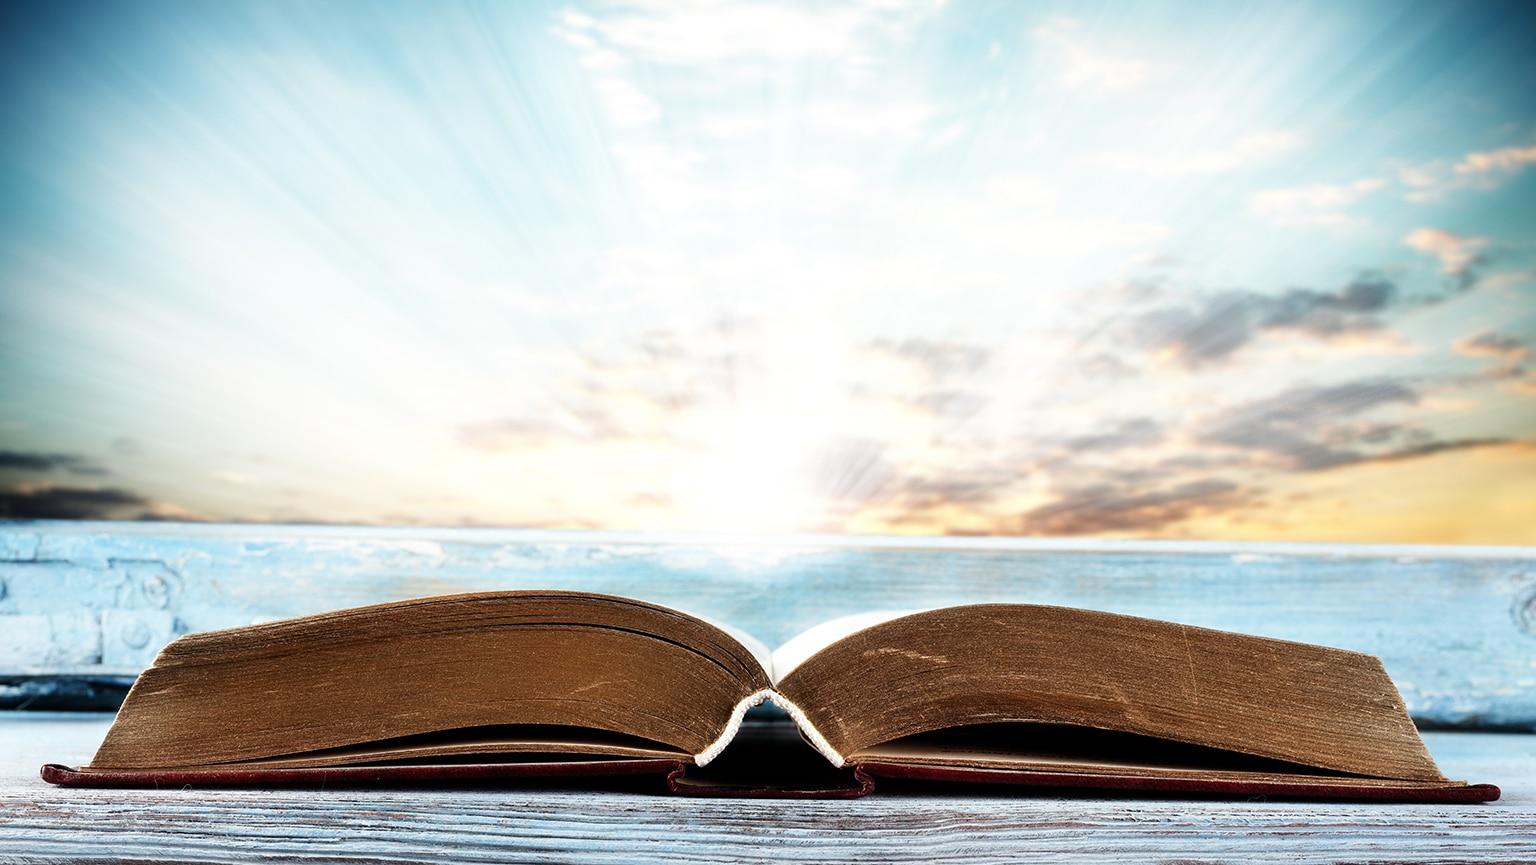 Overview of Biblical Wisdom Literature